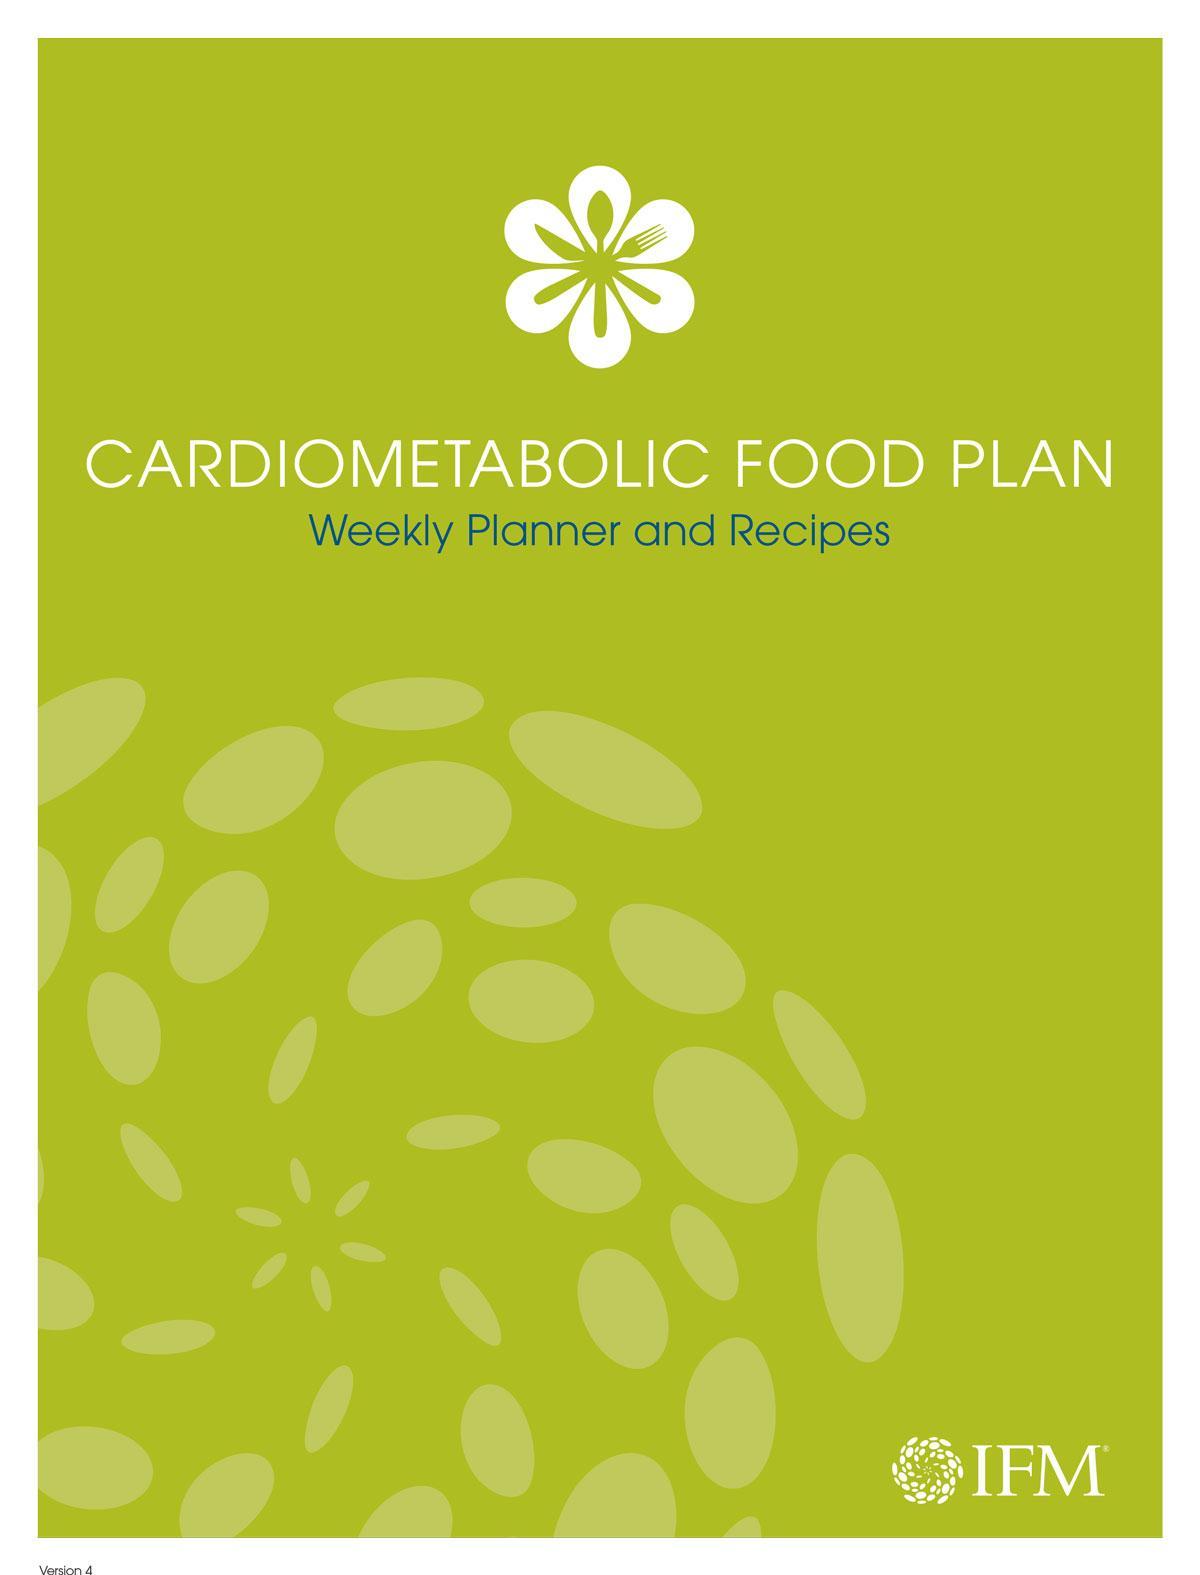 Cardiometabolic Food Plan Weekly Planner